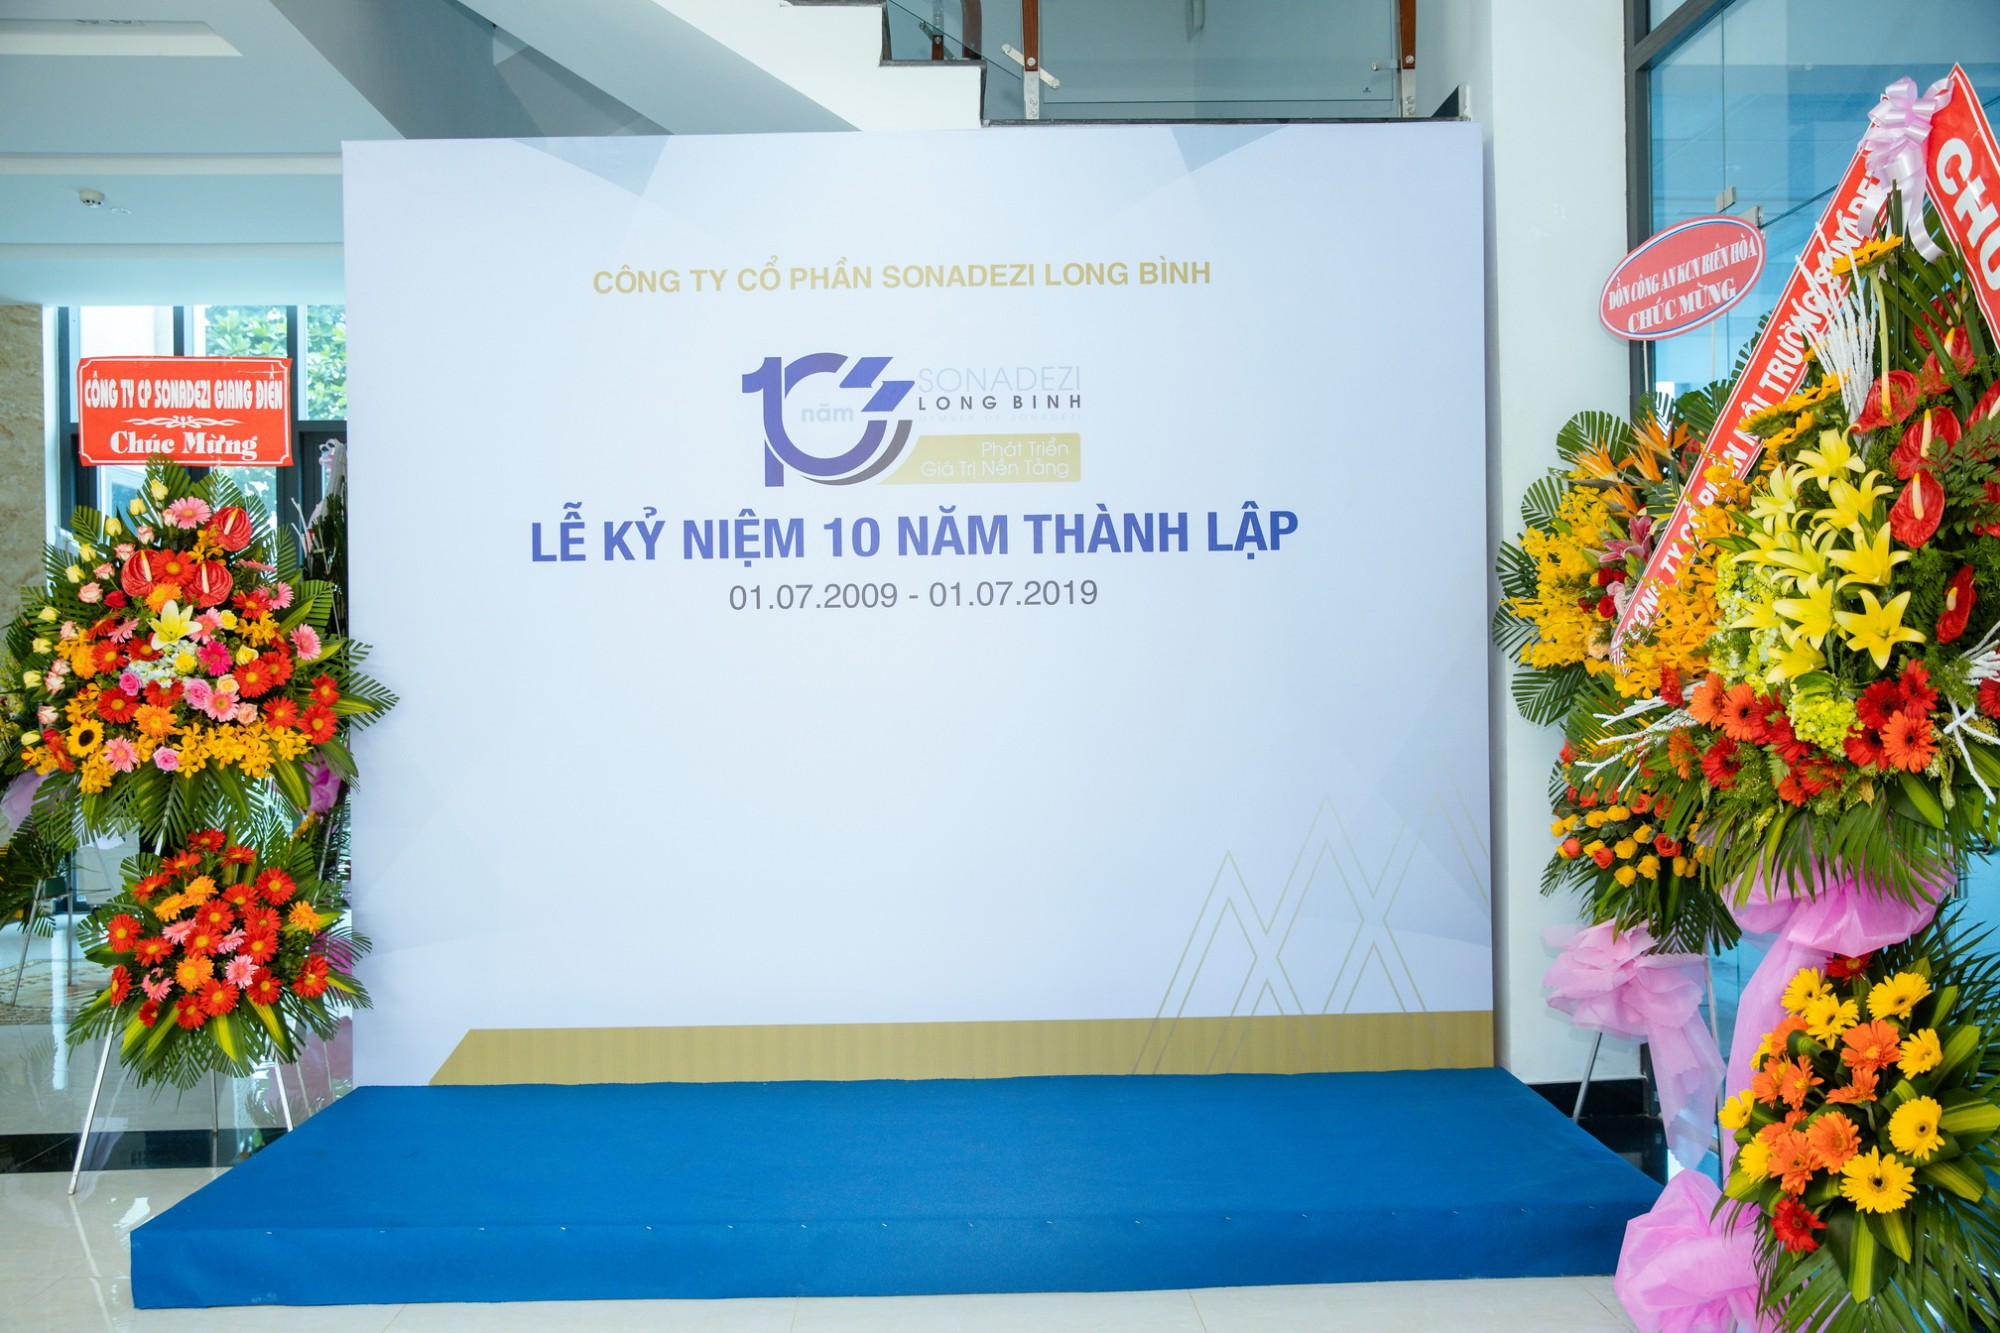 Ceremony 10 years of Sonadezi Long Binh